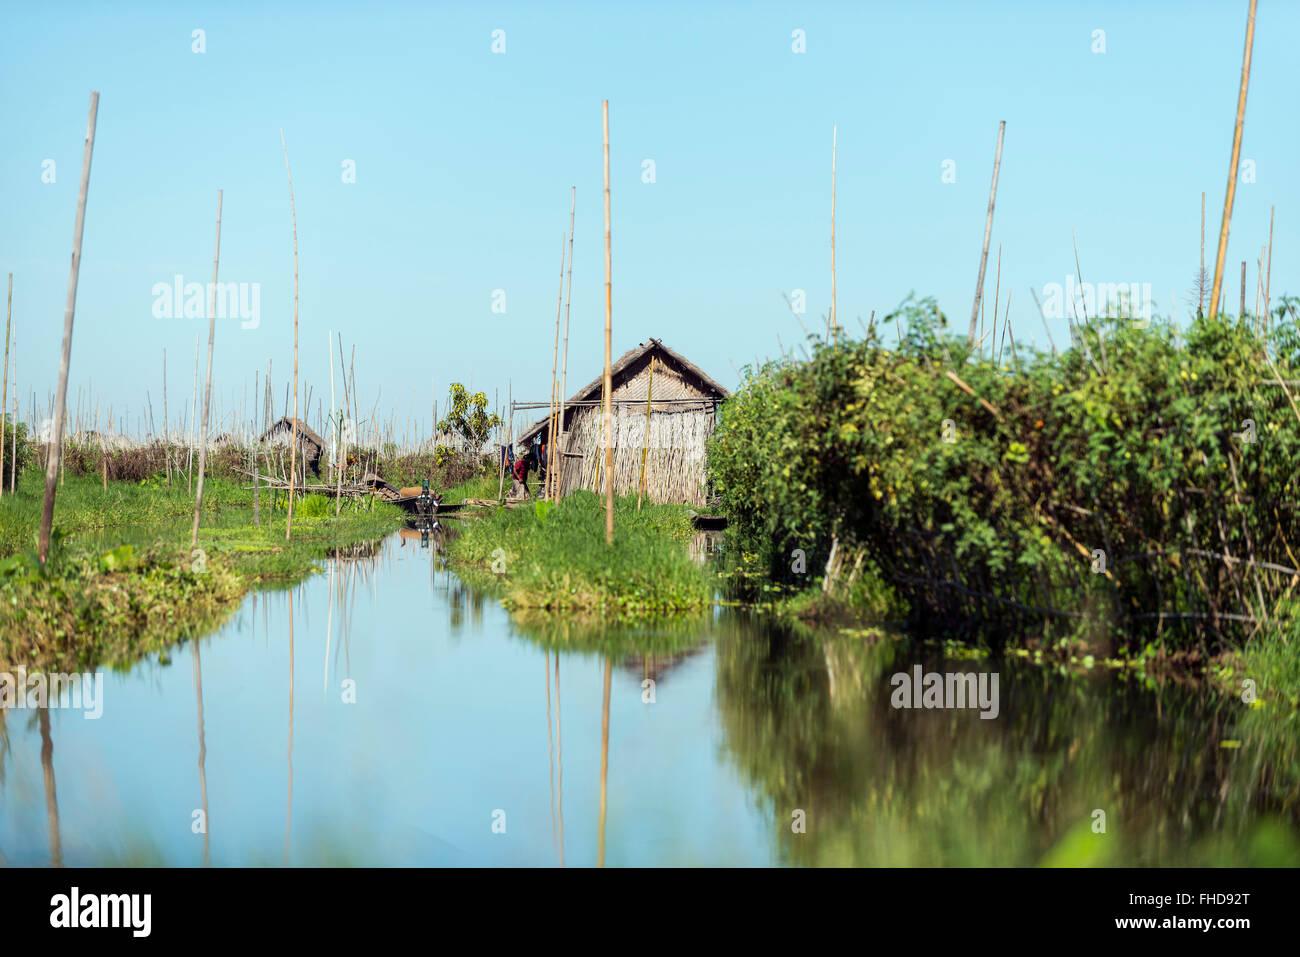 Floating gardens. Inle lake, Burma - Stock Image